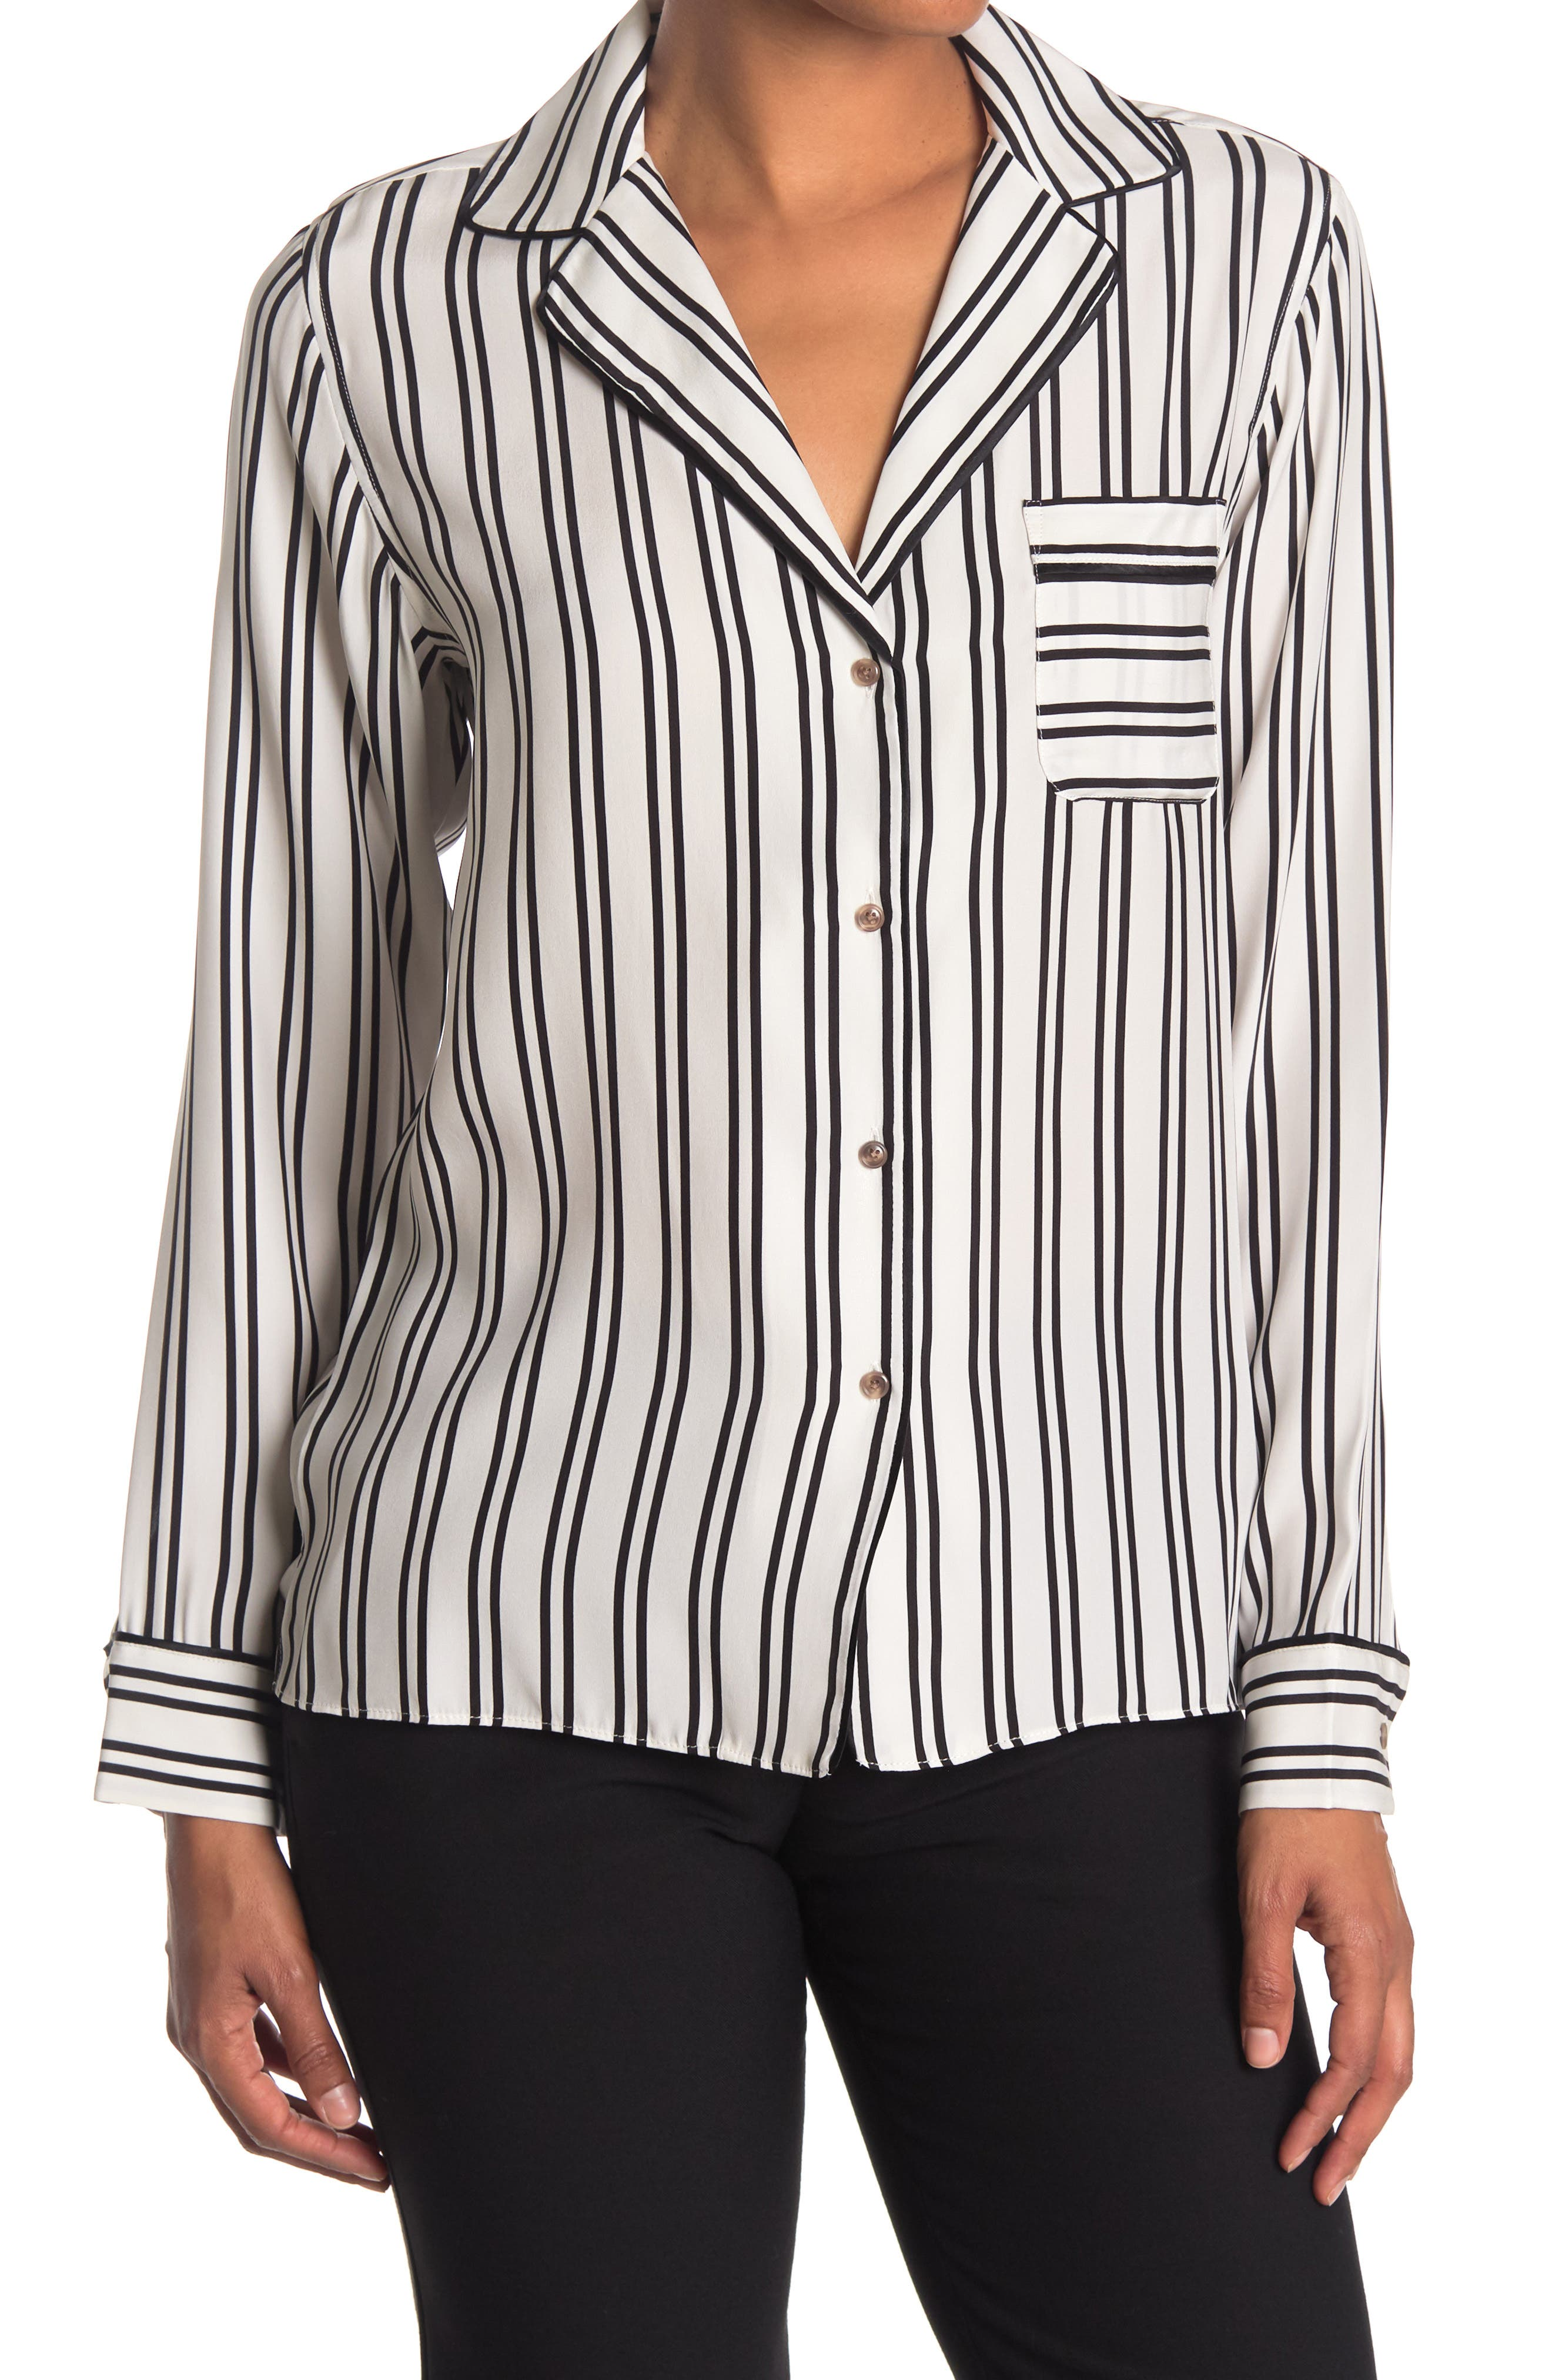 Image of LA LIGNE Leo Striped Shirt